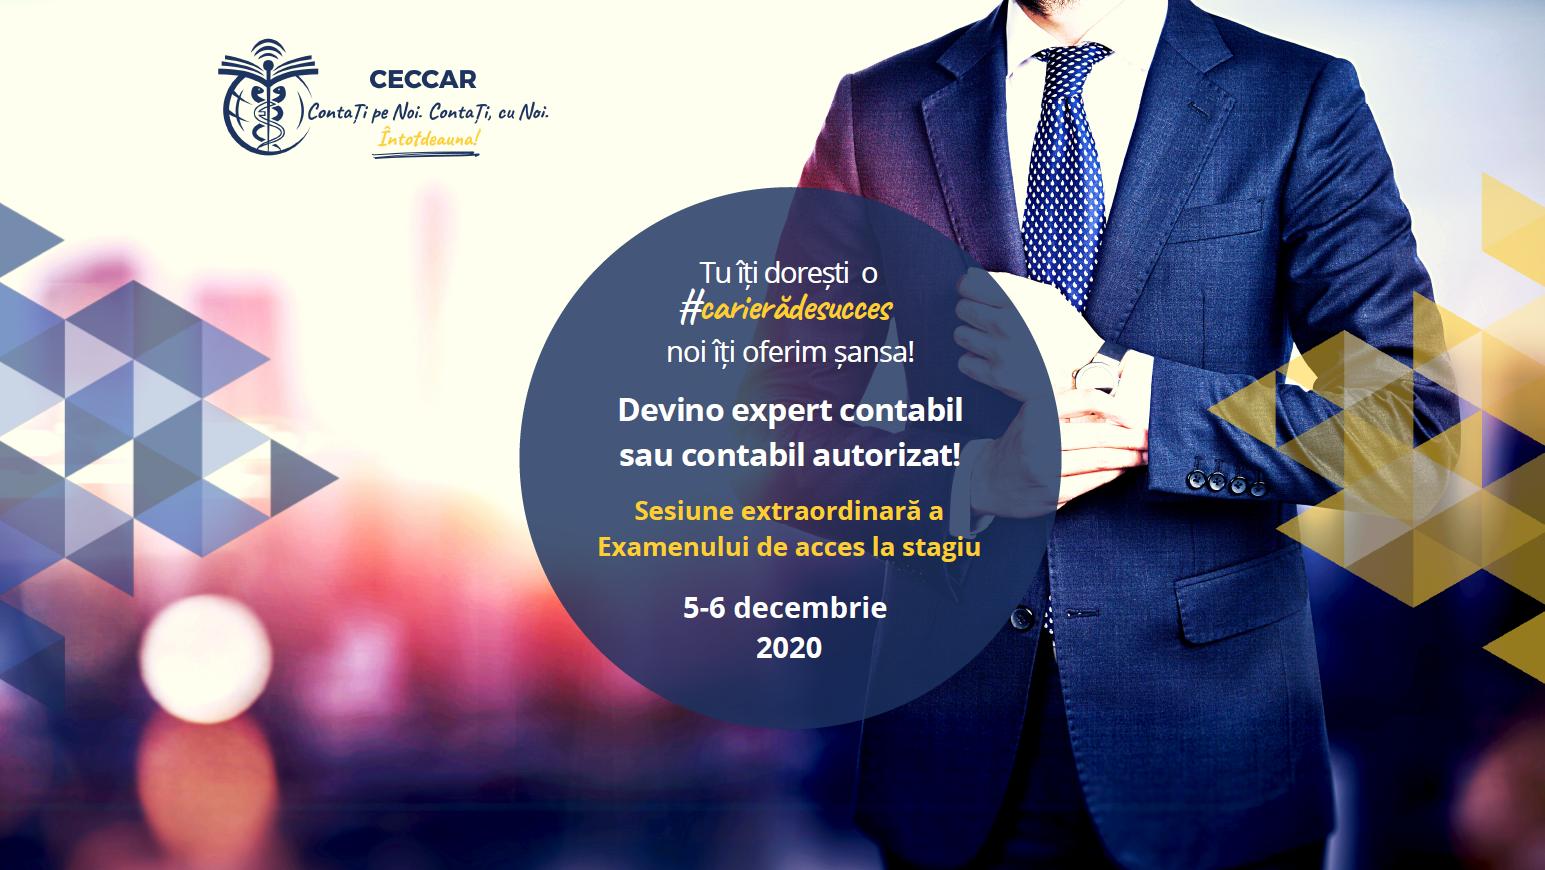 Sesiune extraordinara Examen de acces CECCAR decembrie 2020